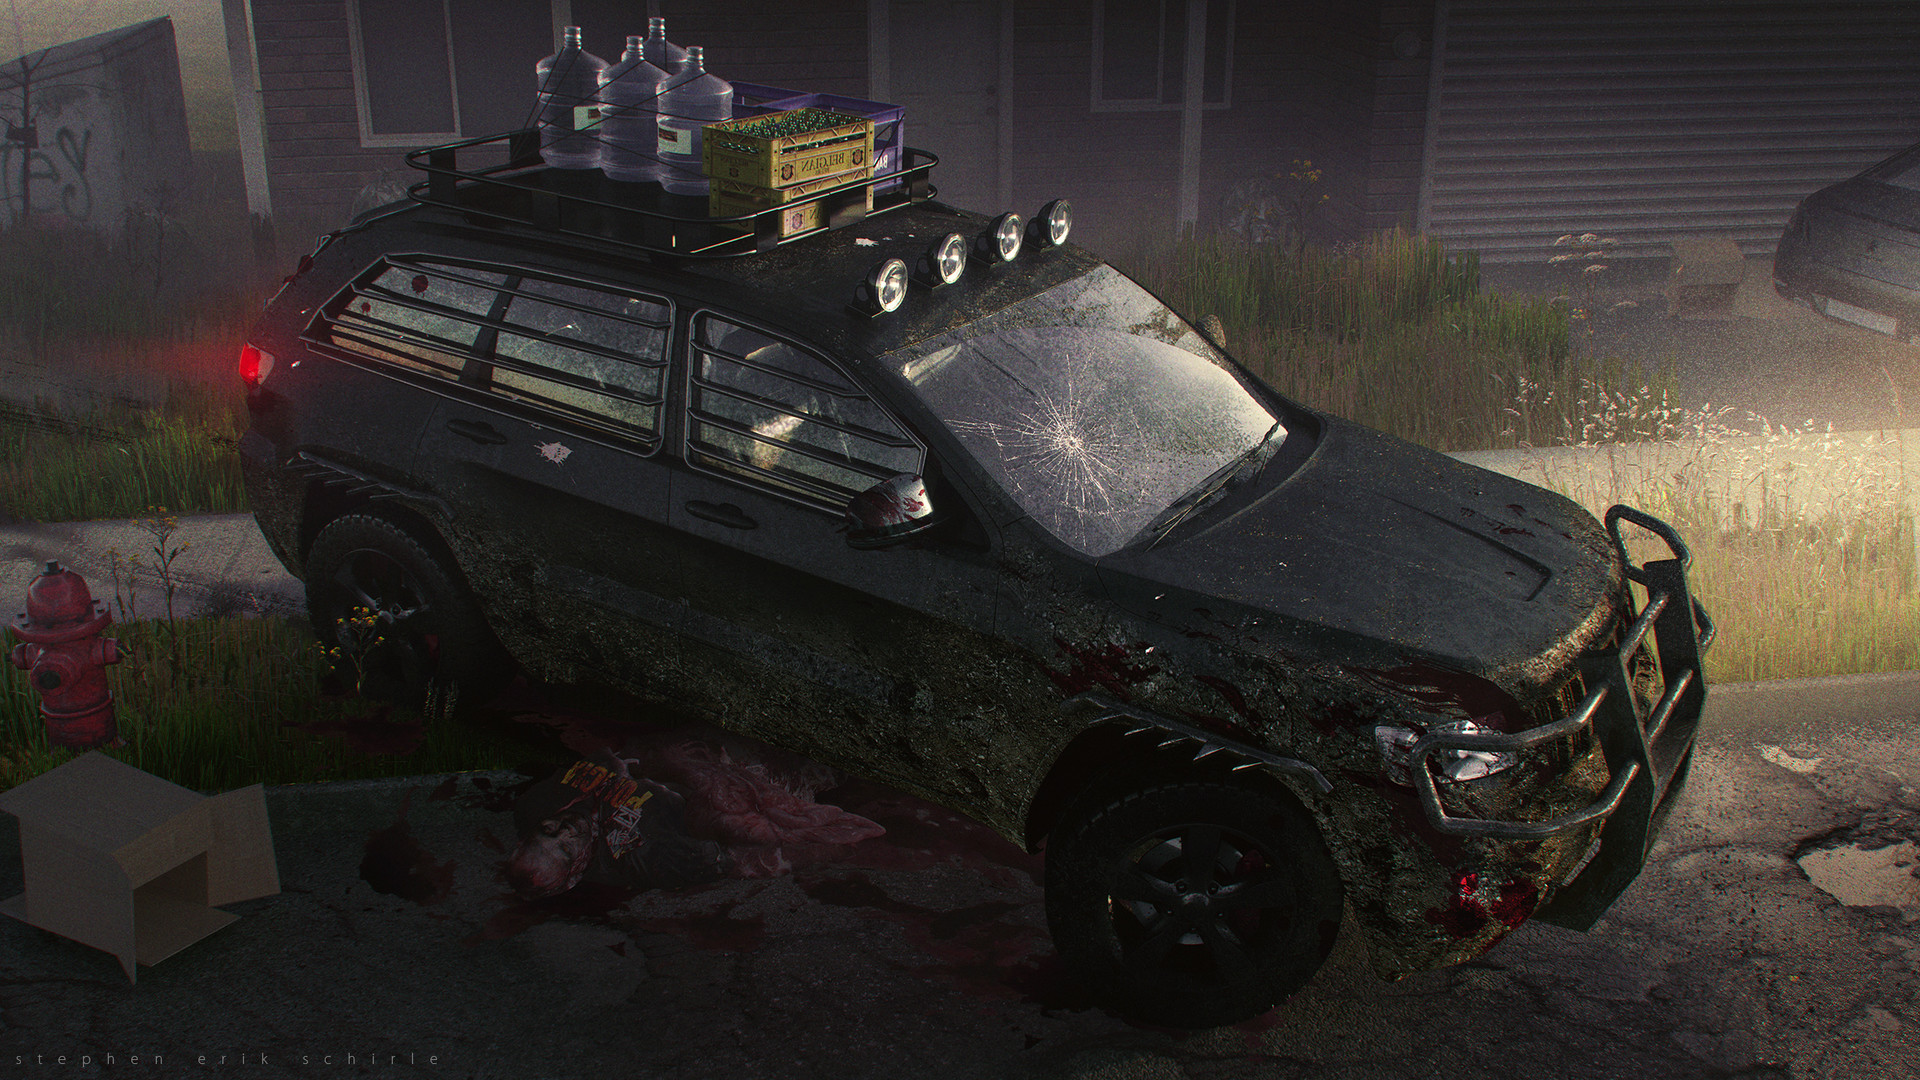 Stephen schirle jeep 02